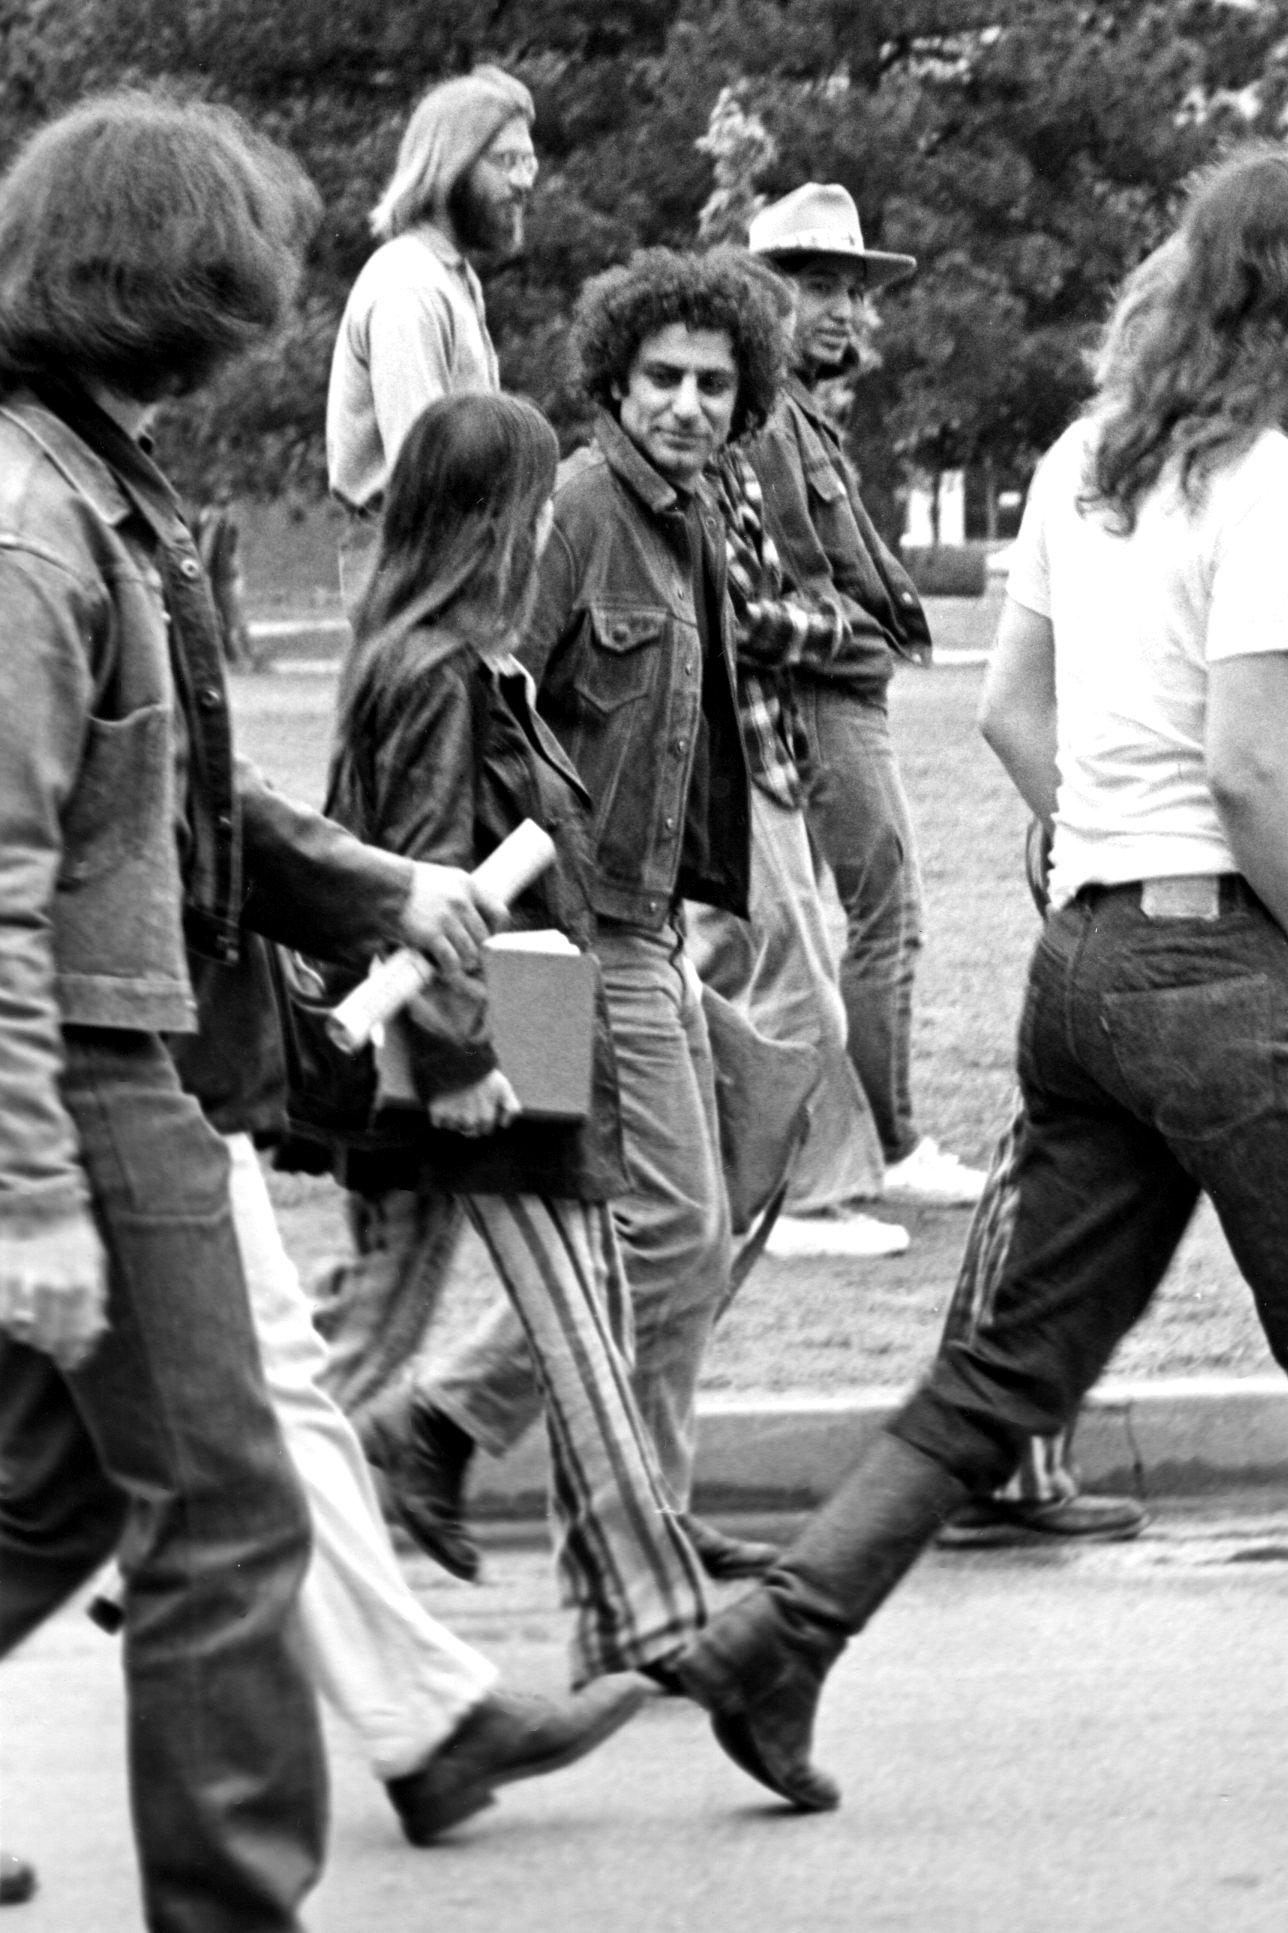 Abbie_Hoffman_visiting_the_University_of_Oklahoma_circa_1969